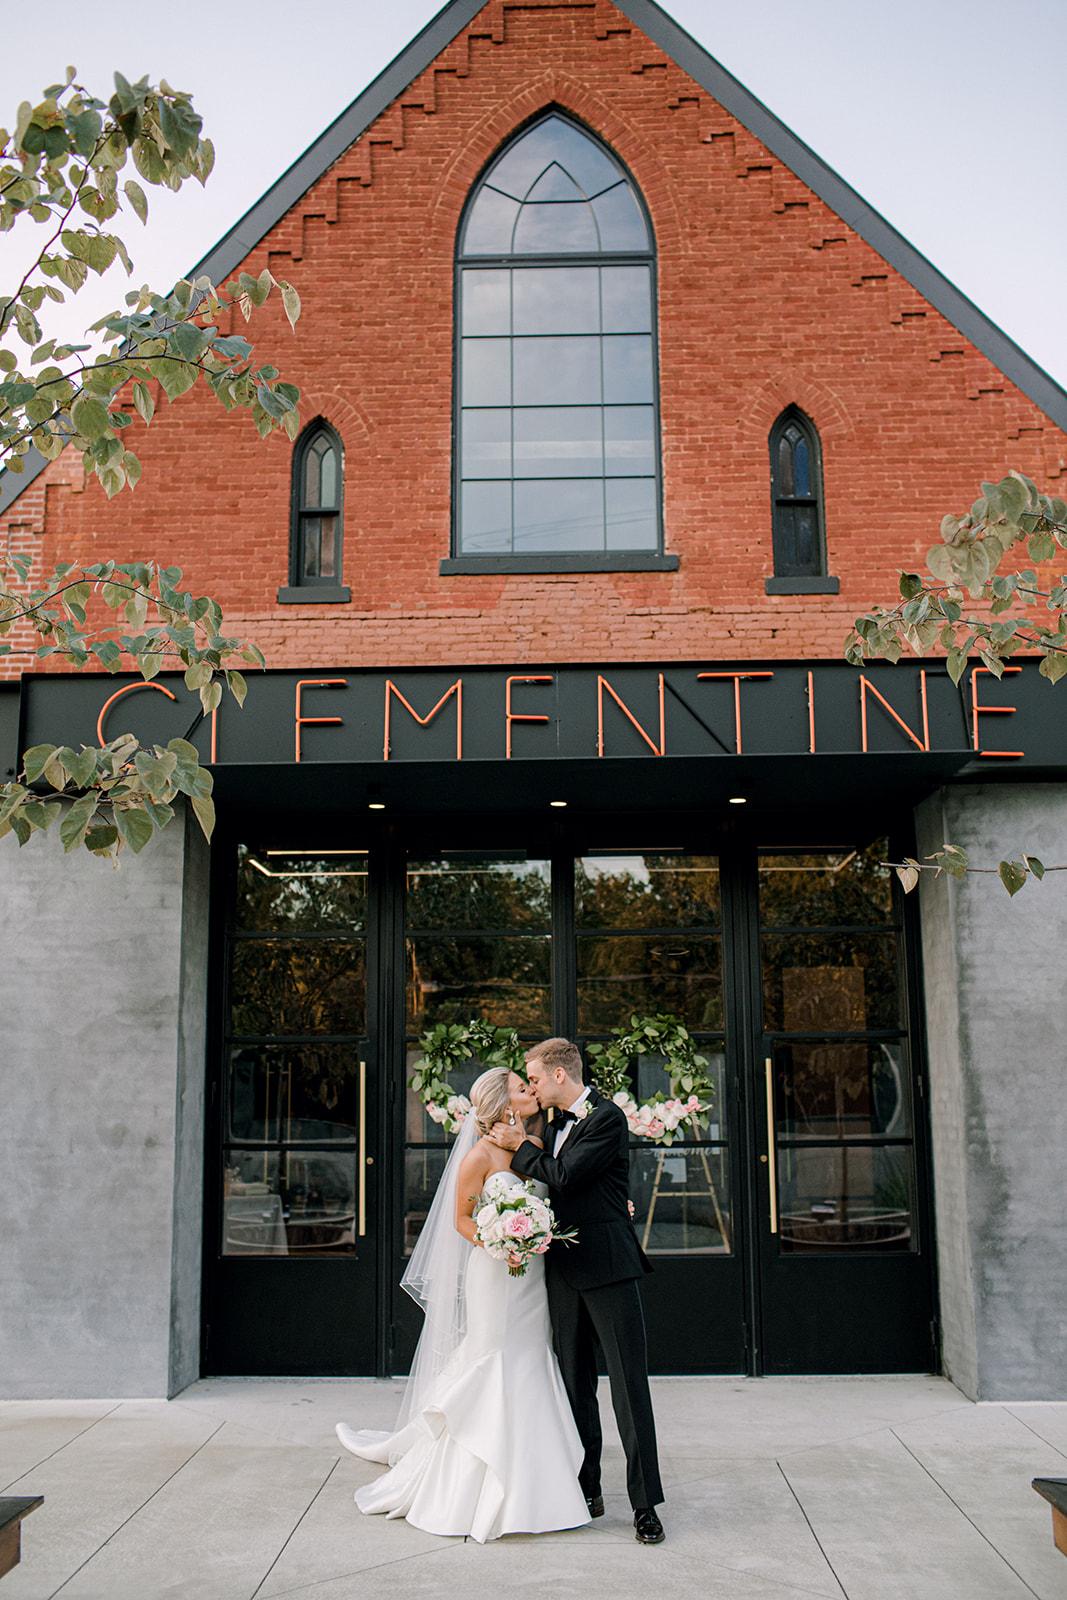 Clementine Nashville wedding photography